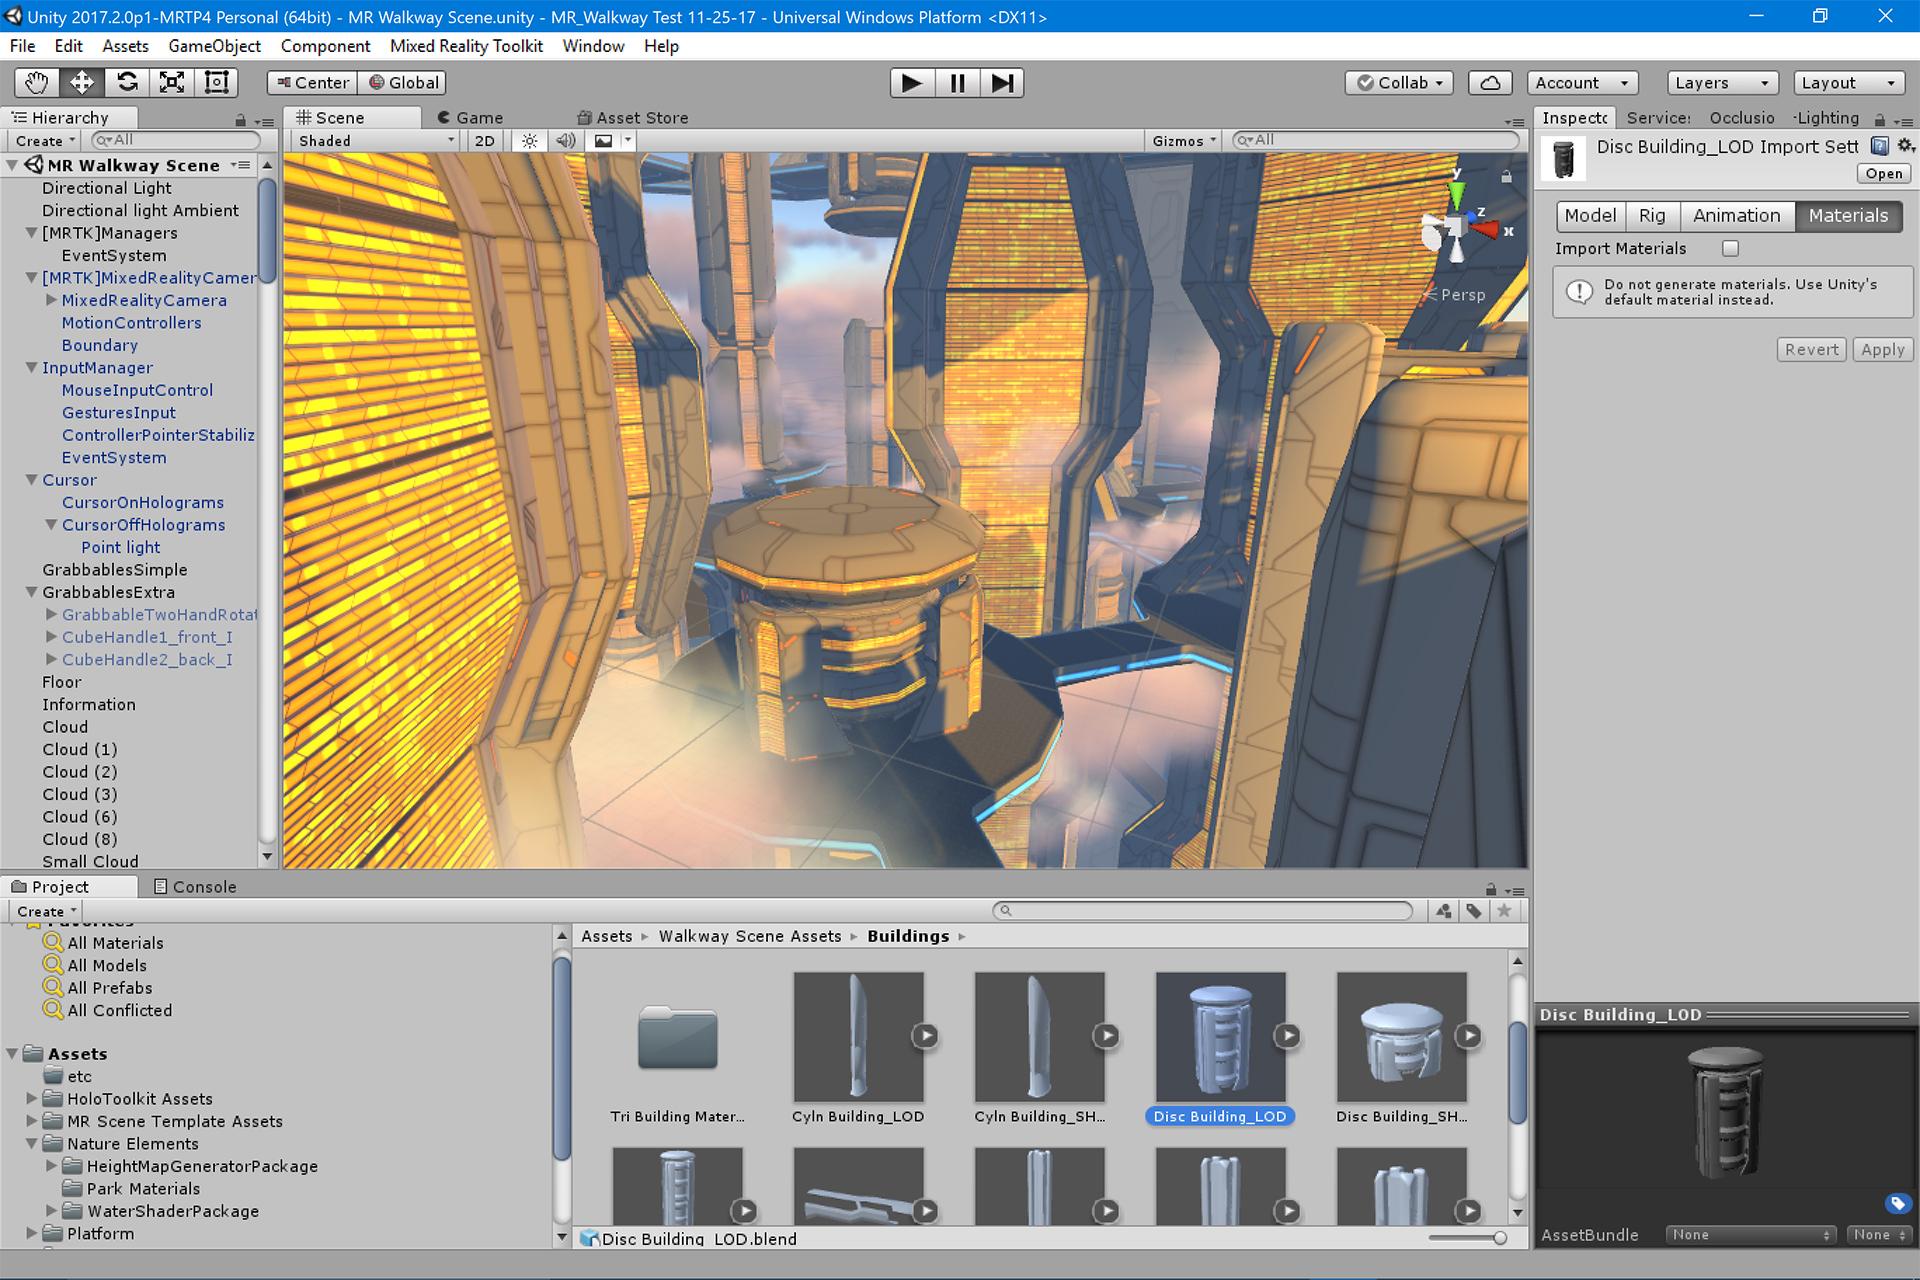 VR Navigation with Motion Controller Joysticks in Unity